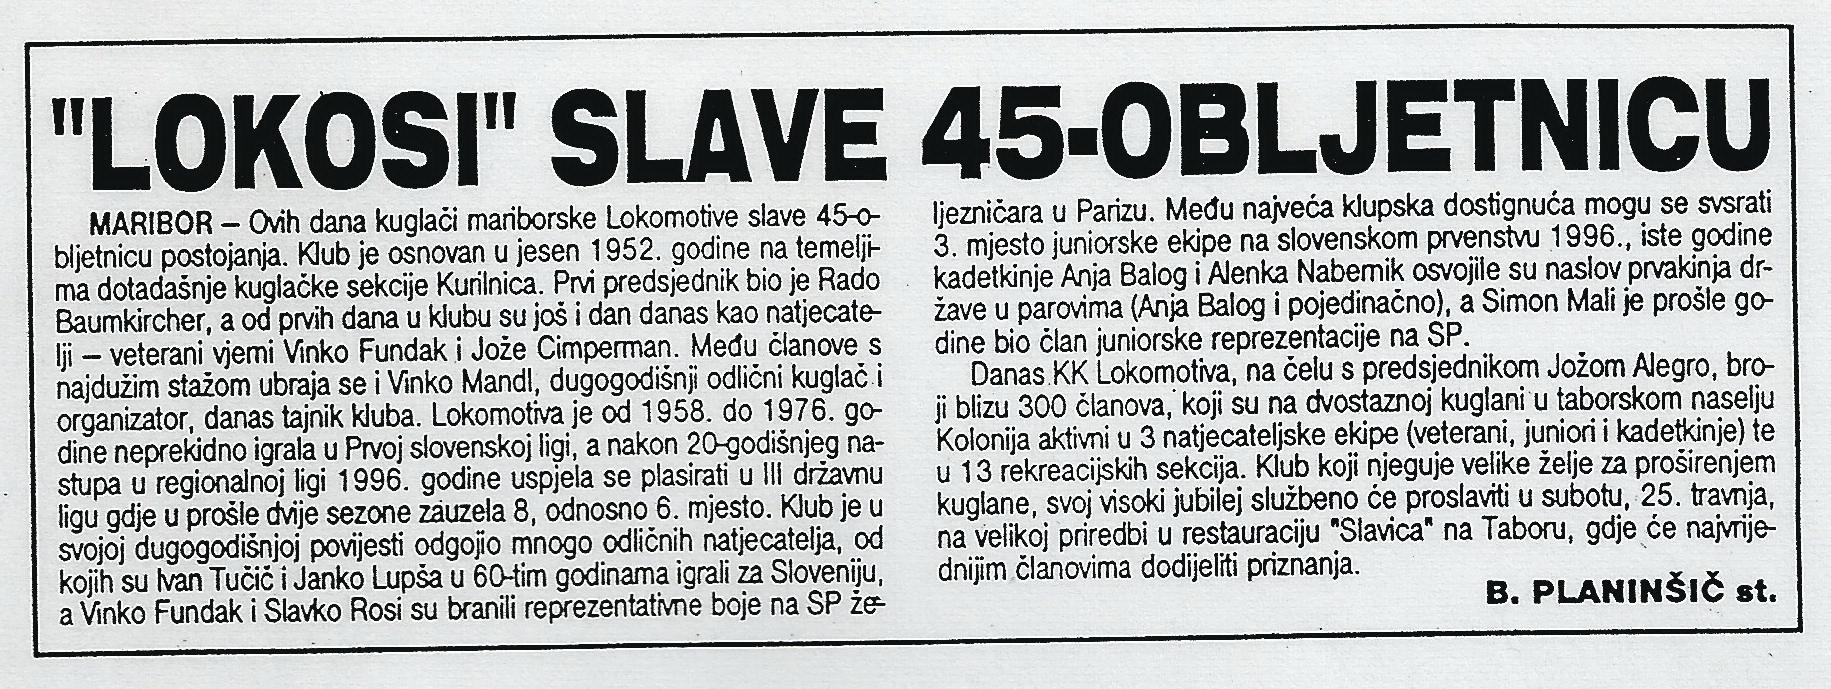 45 obletnica, Sportske Novosti, 1997